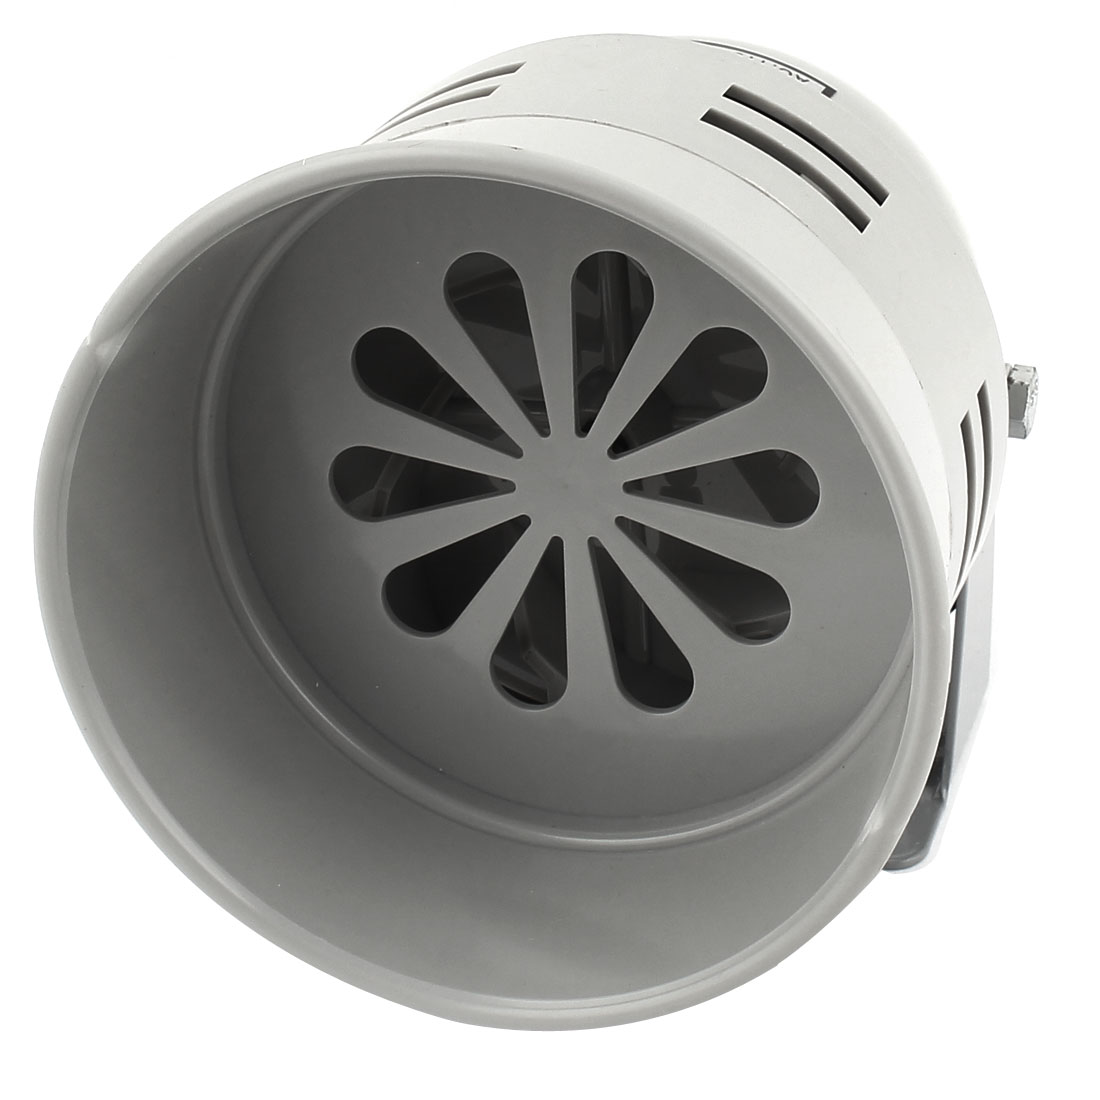 Gray Plastic Industrial Alarm Sound Motor Siren Horn 130dB AC 110V 40W